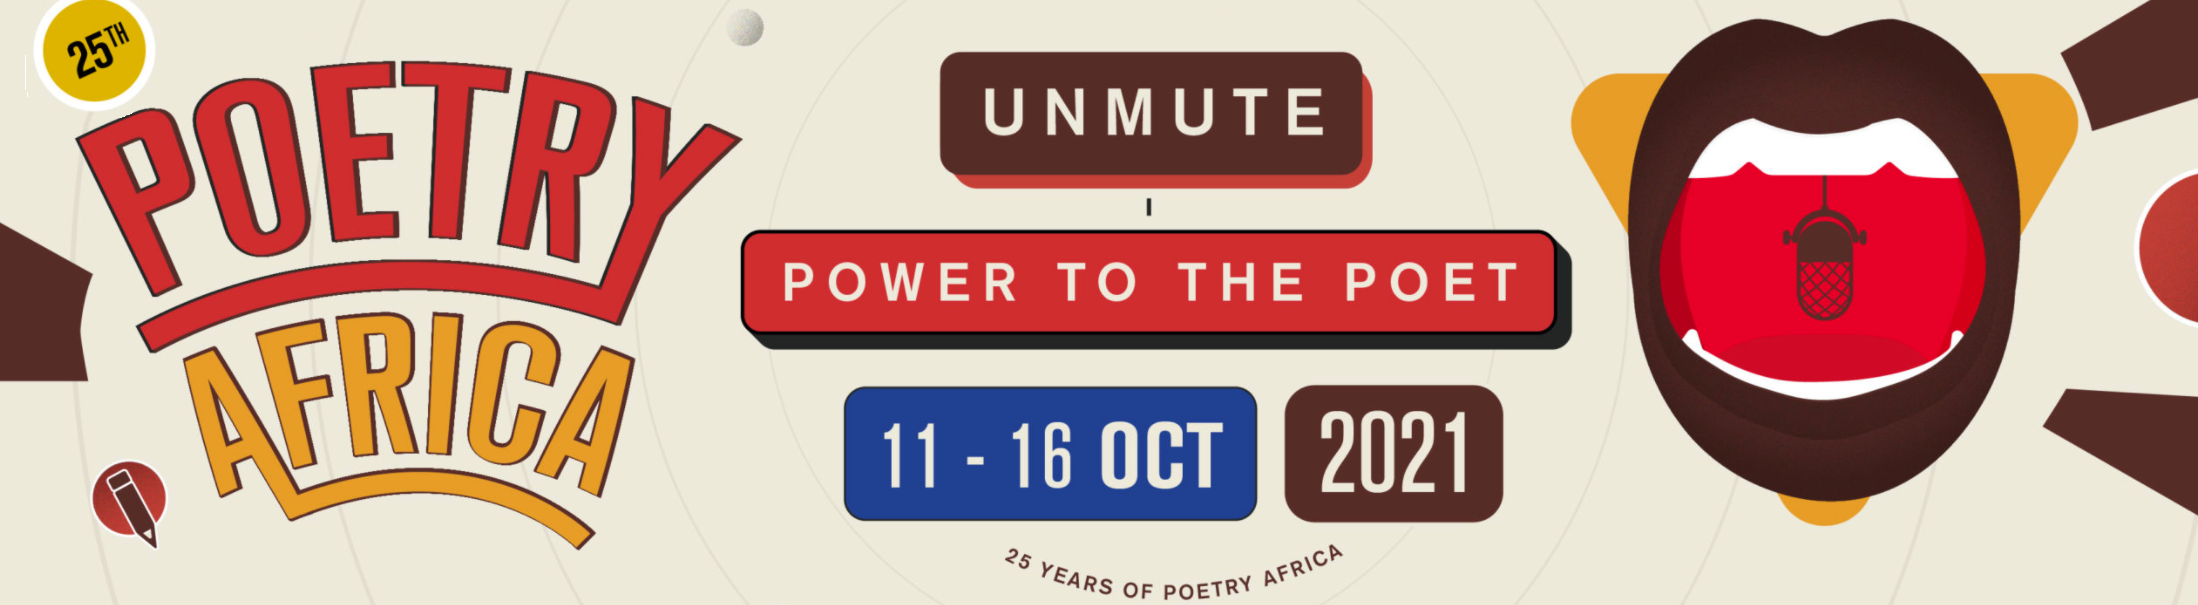 PoetryAfrica_2021_narrowWeb (1)